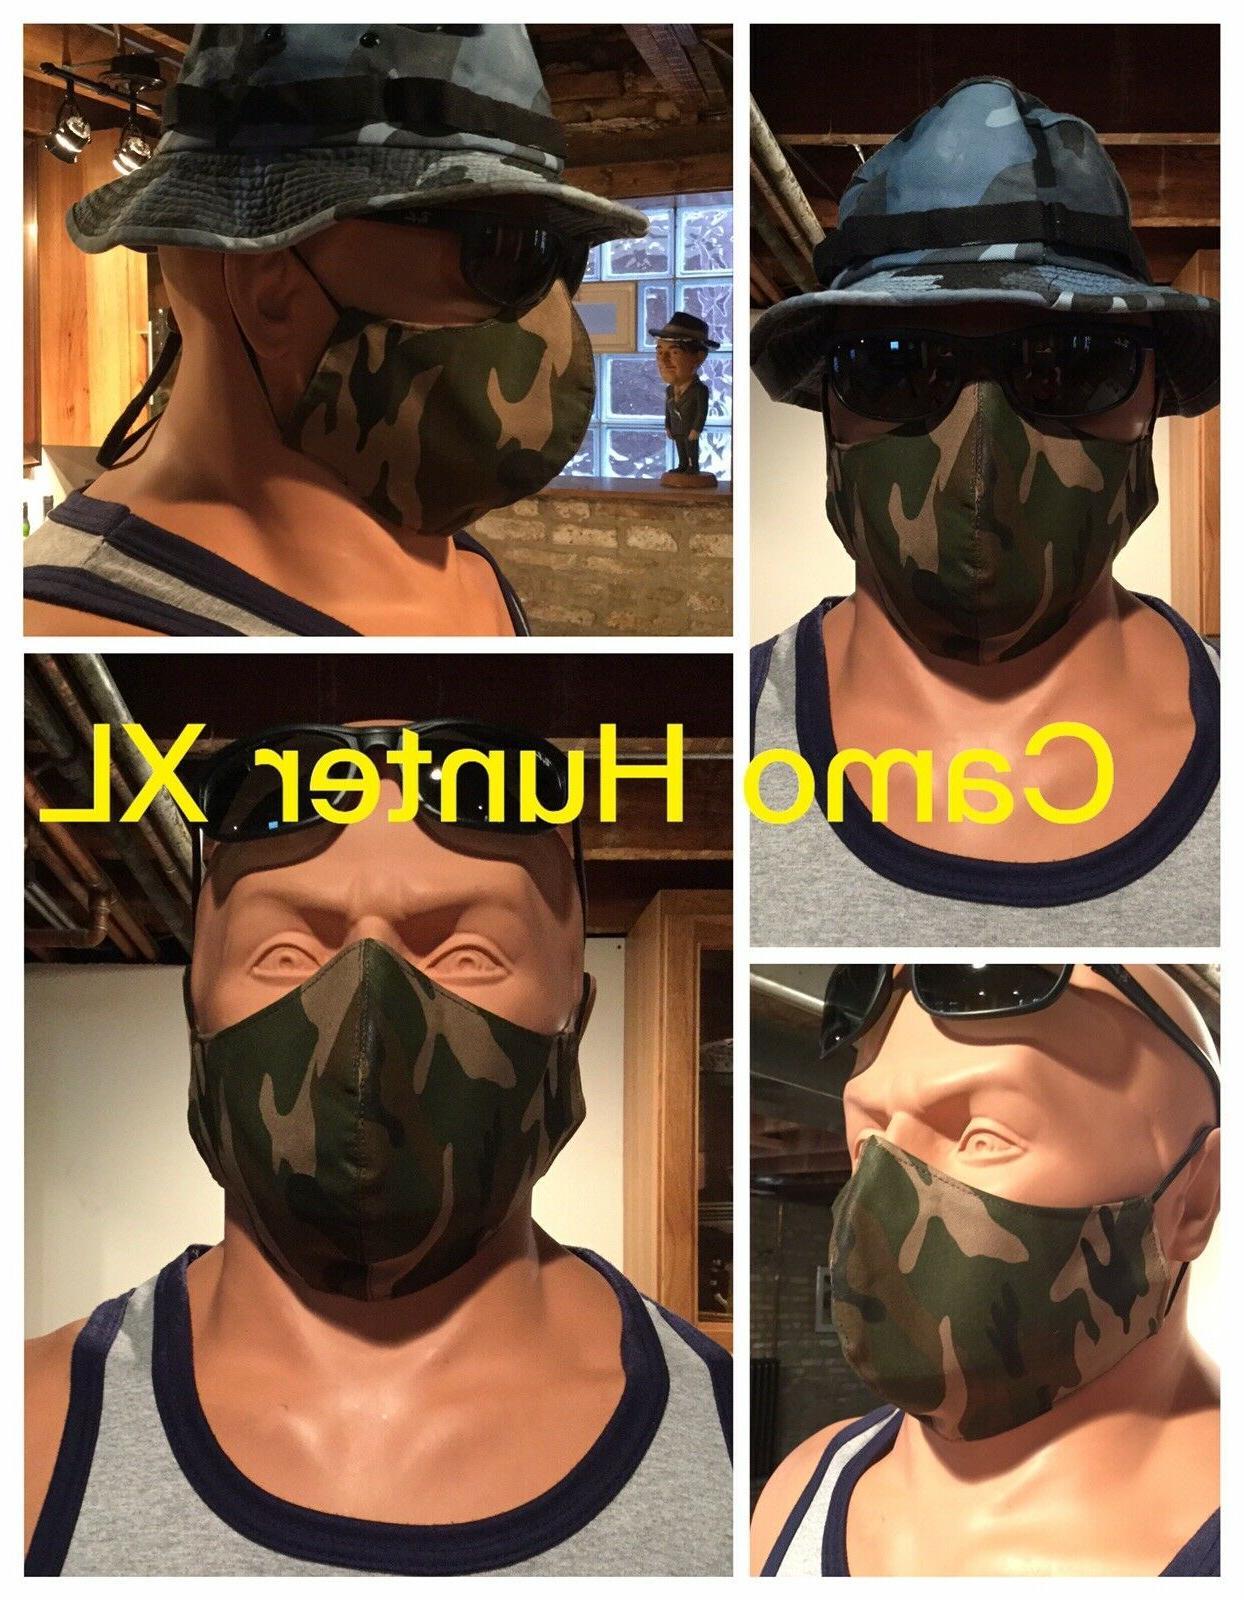 XXL Extra Big Size Knit Cotton Mask Filter Pocket Men